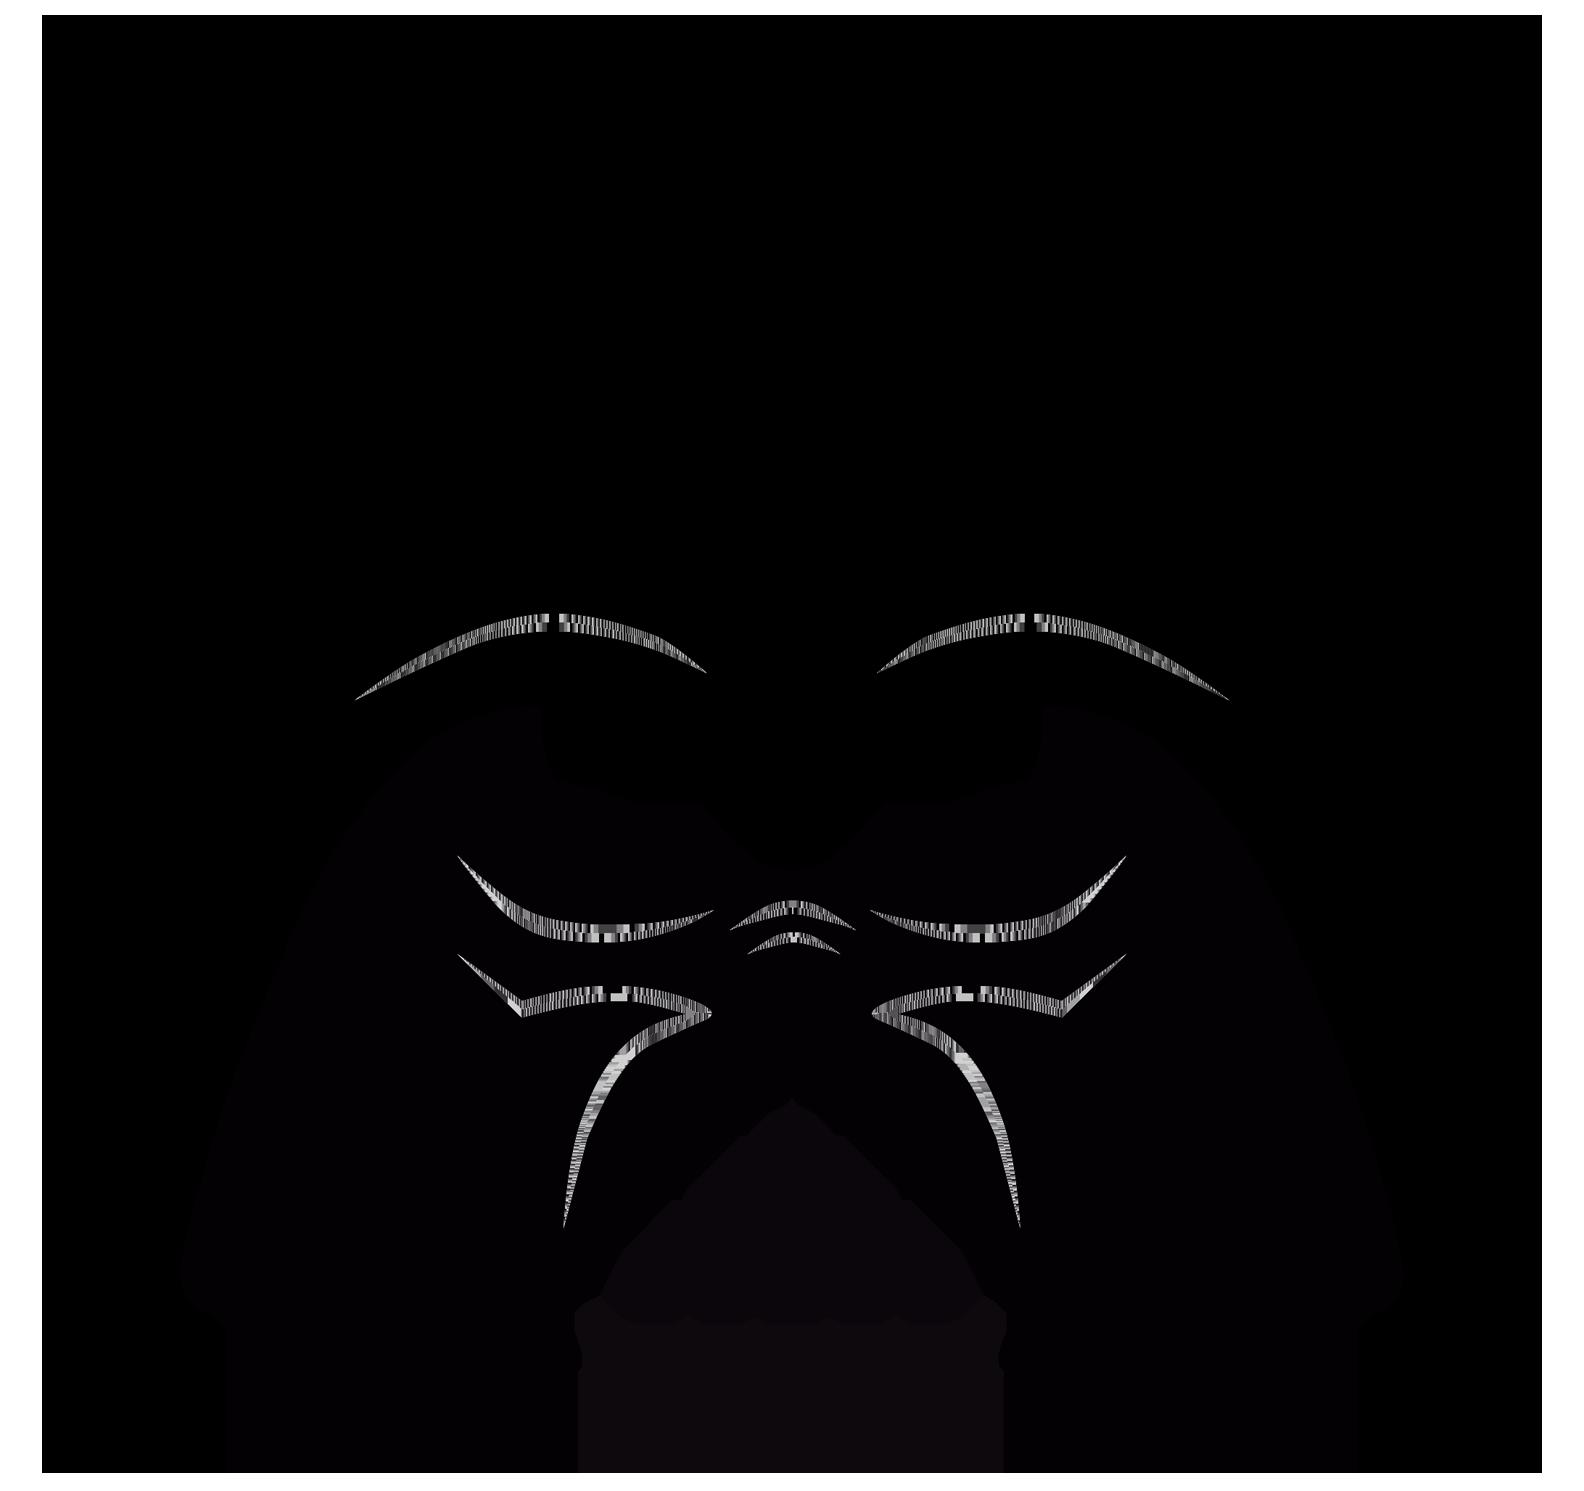 Anakin skywalker drawing star. Darth vader clipart yoda